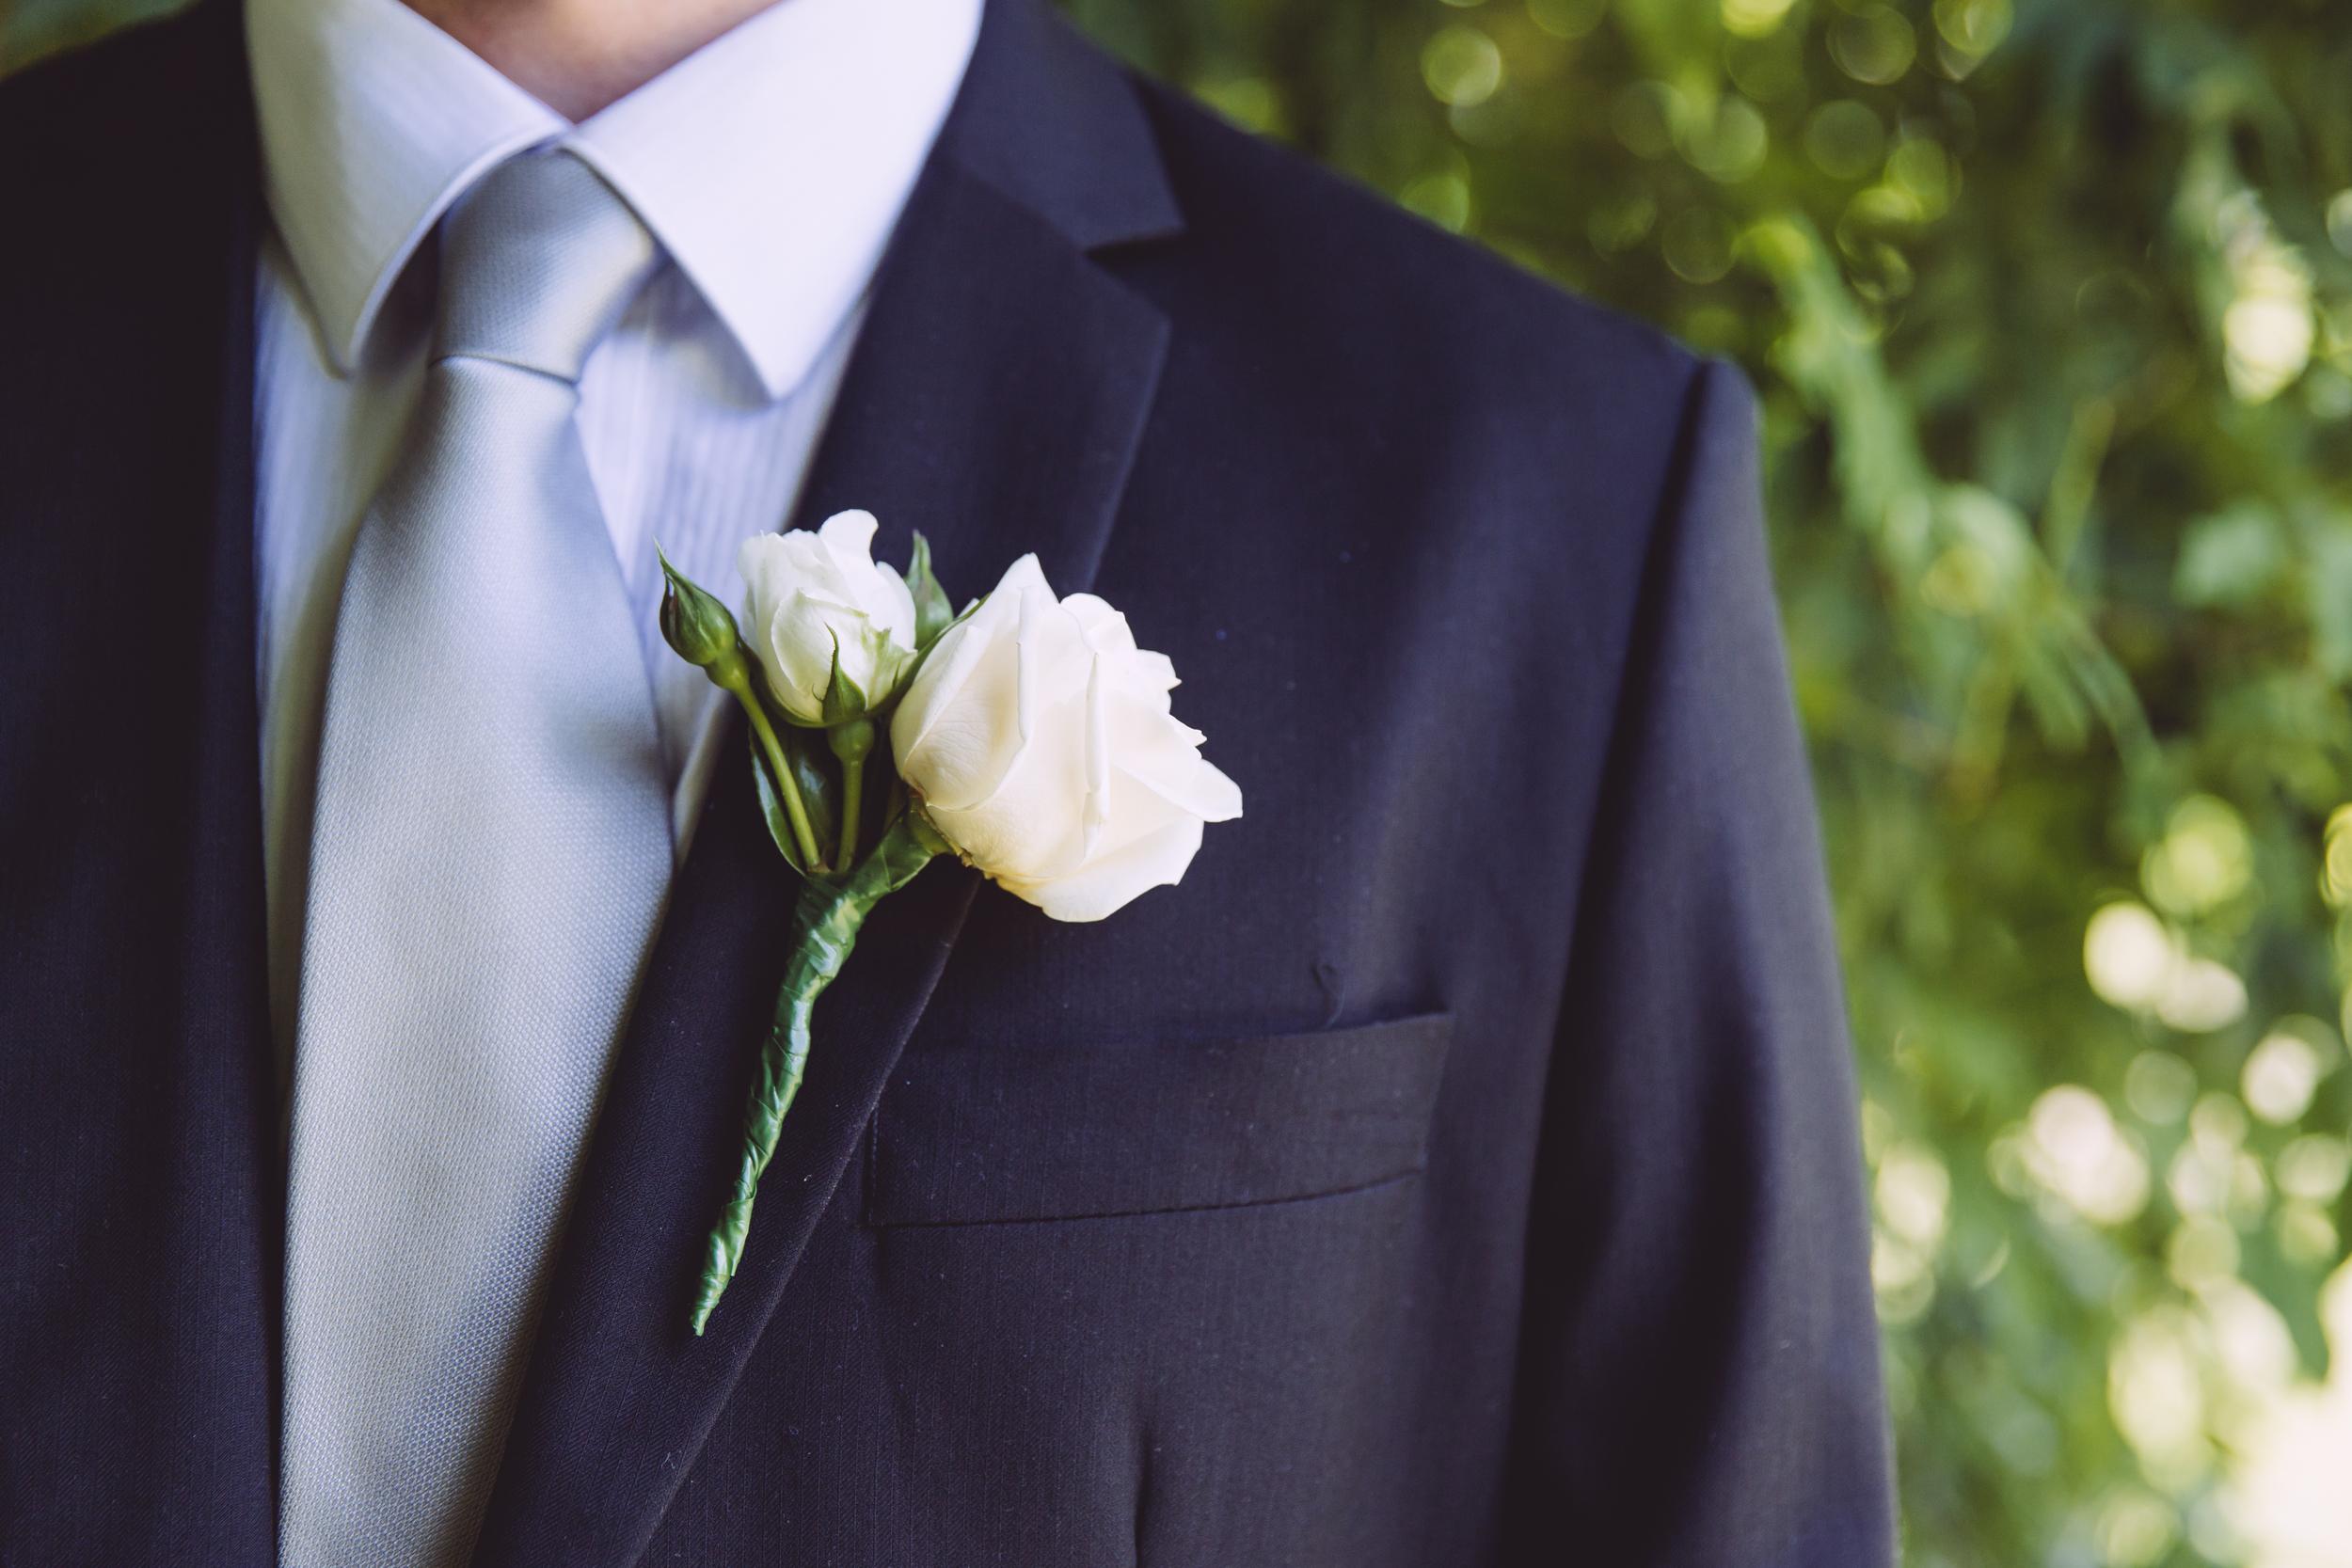 Groom on wedding day